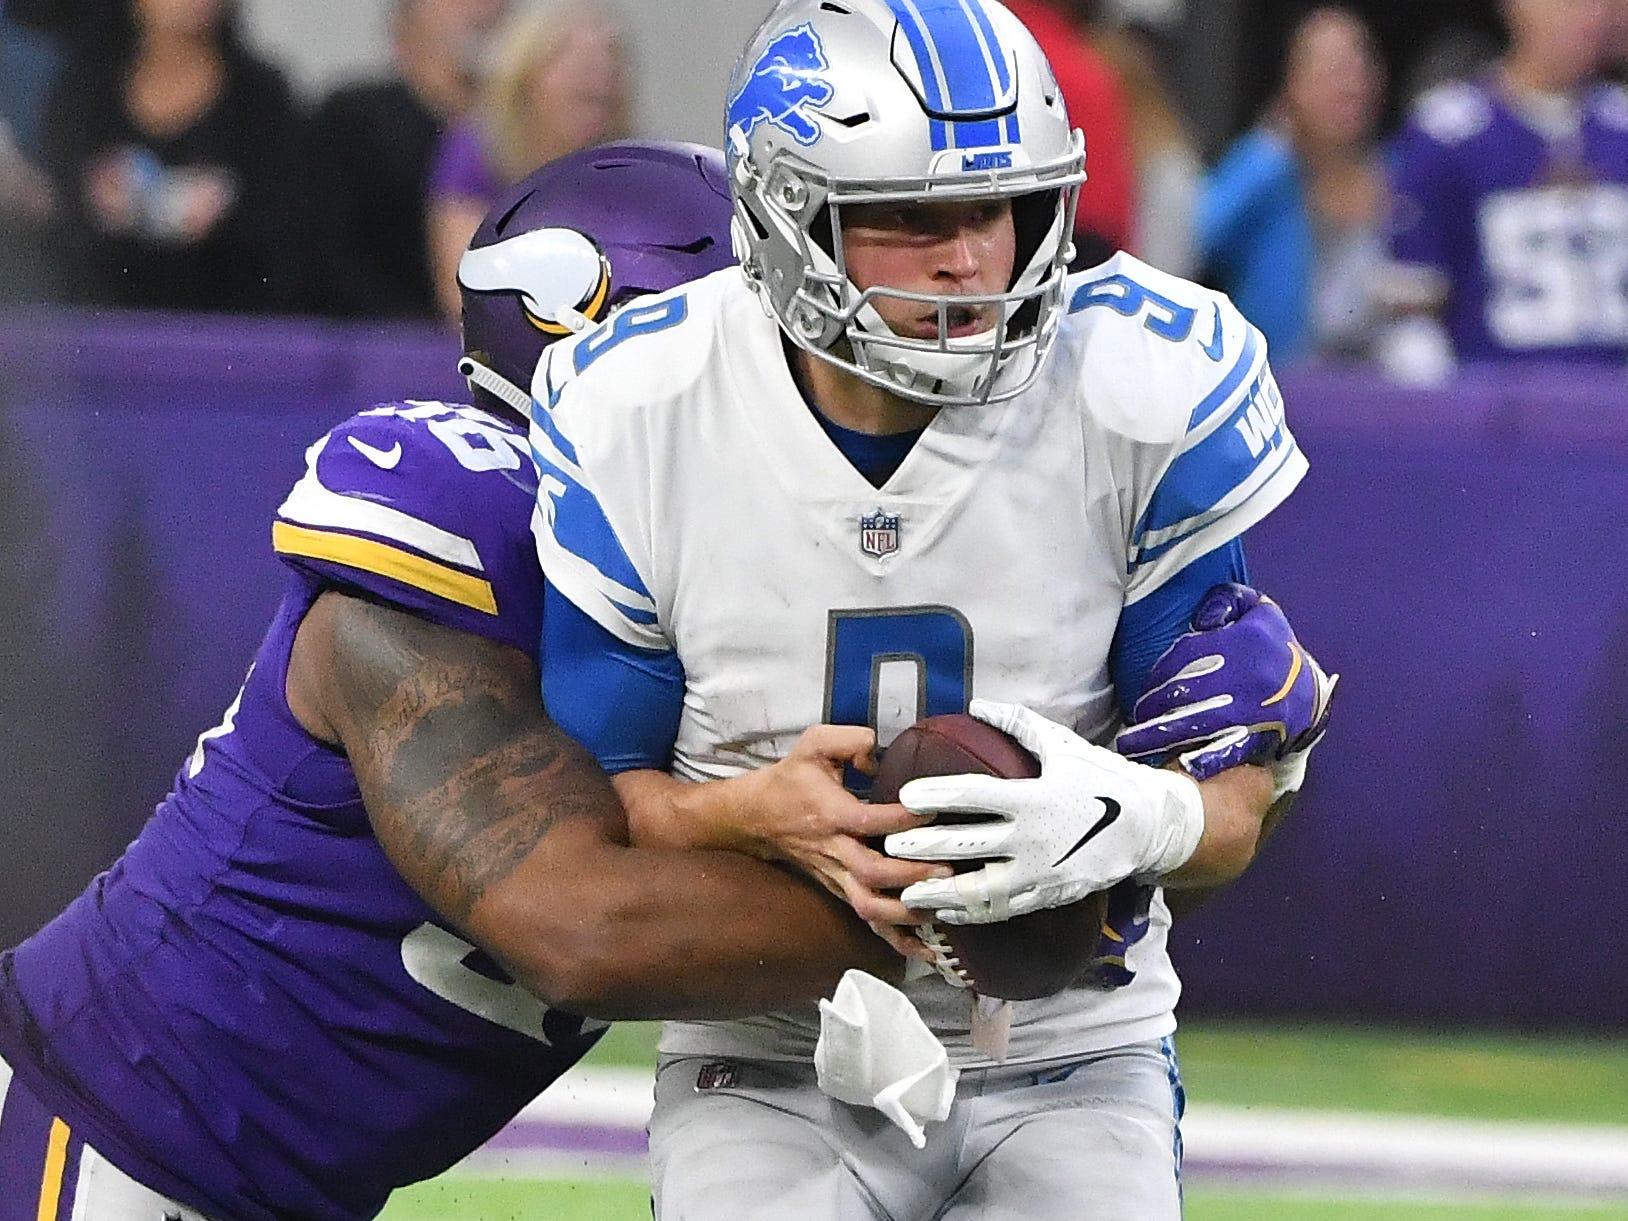 Vikings' Tom Johnson sacks Lions quarterback Matthew Stafford in the fourth quarter.